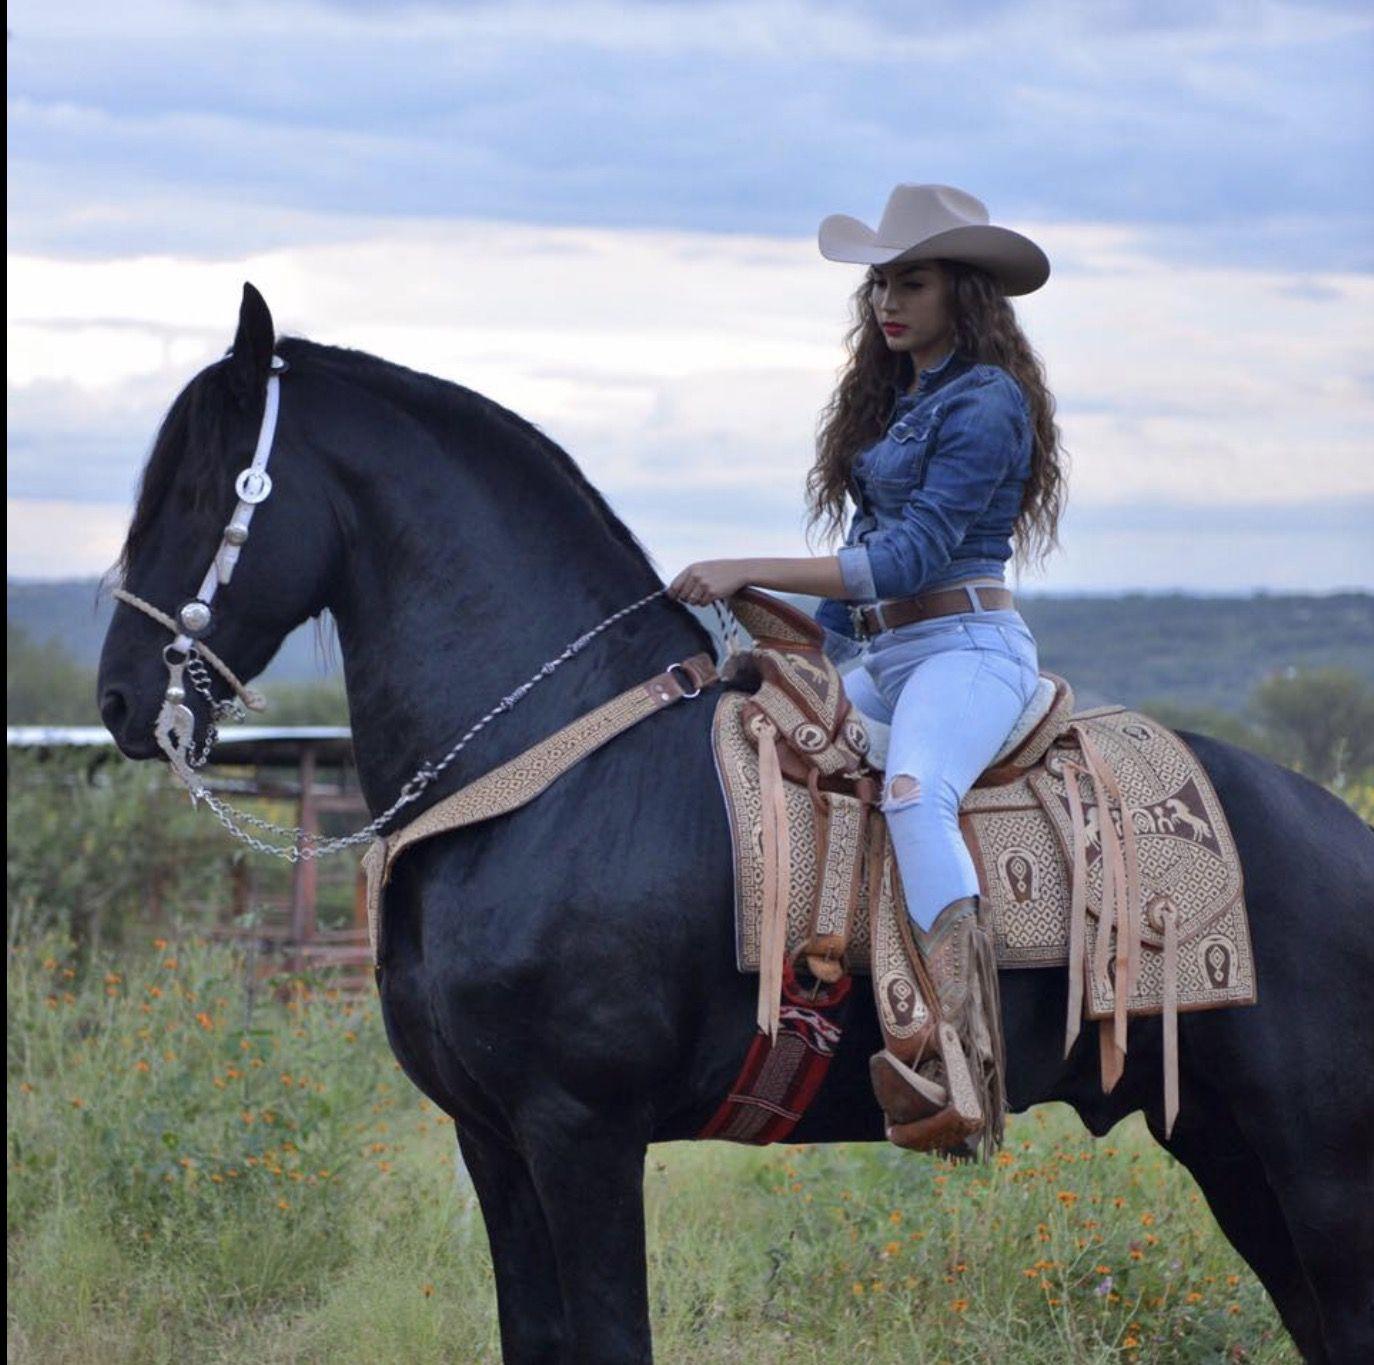 f2b31f1db531c  Vaquero  Estilo  Charro  Escaramuza  Rodeo  Vacas  Rancho  HombresVaqueros   MujeresVaqueras  RopaVaquera  Texana  Botas  Becerro  BullRanch   RoyalPalmHats